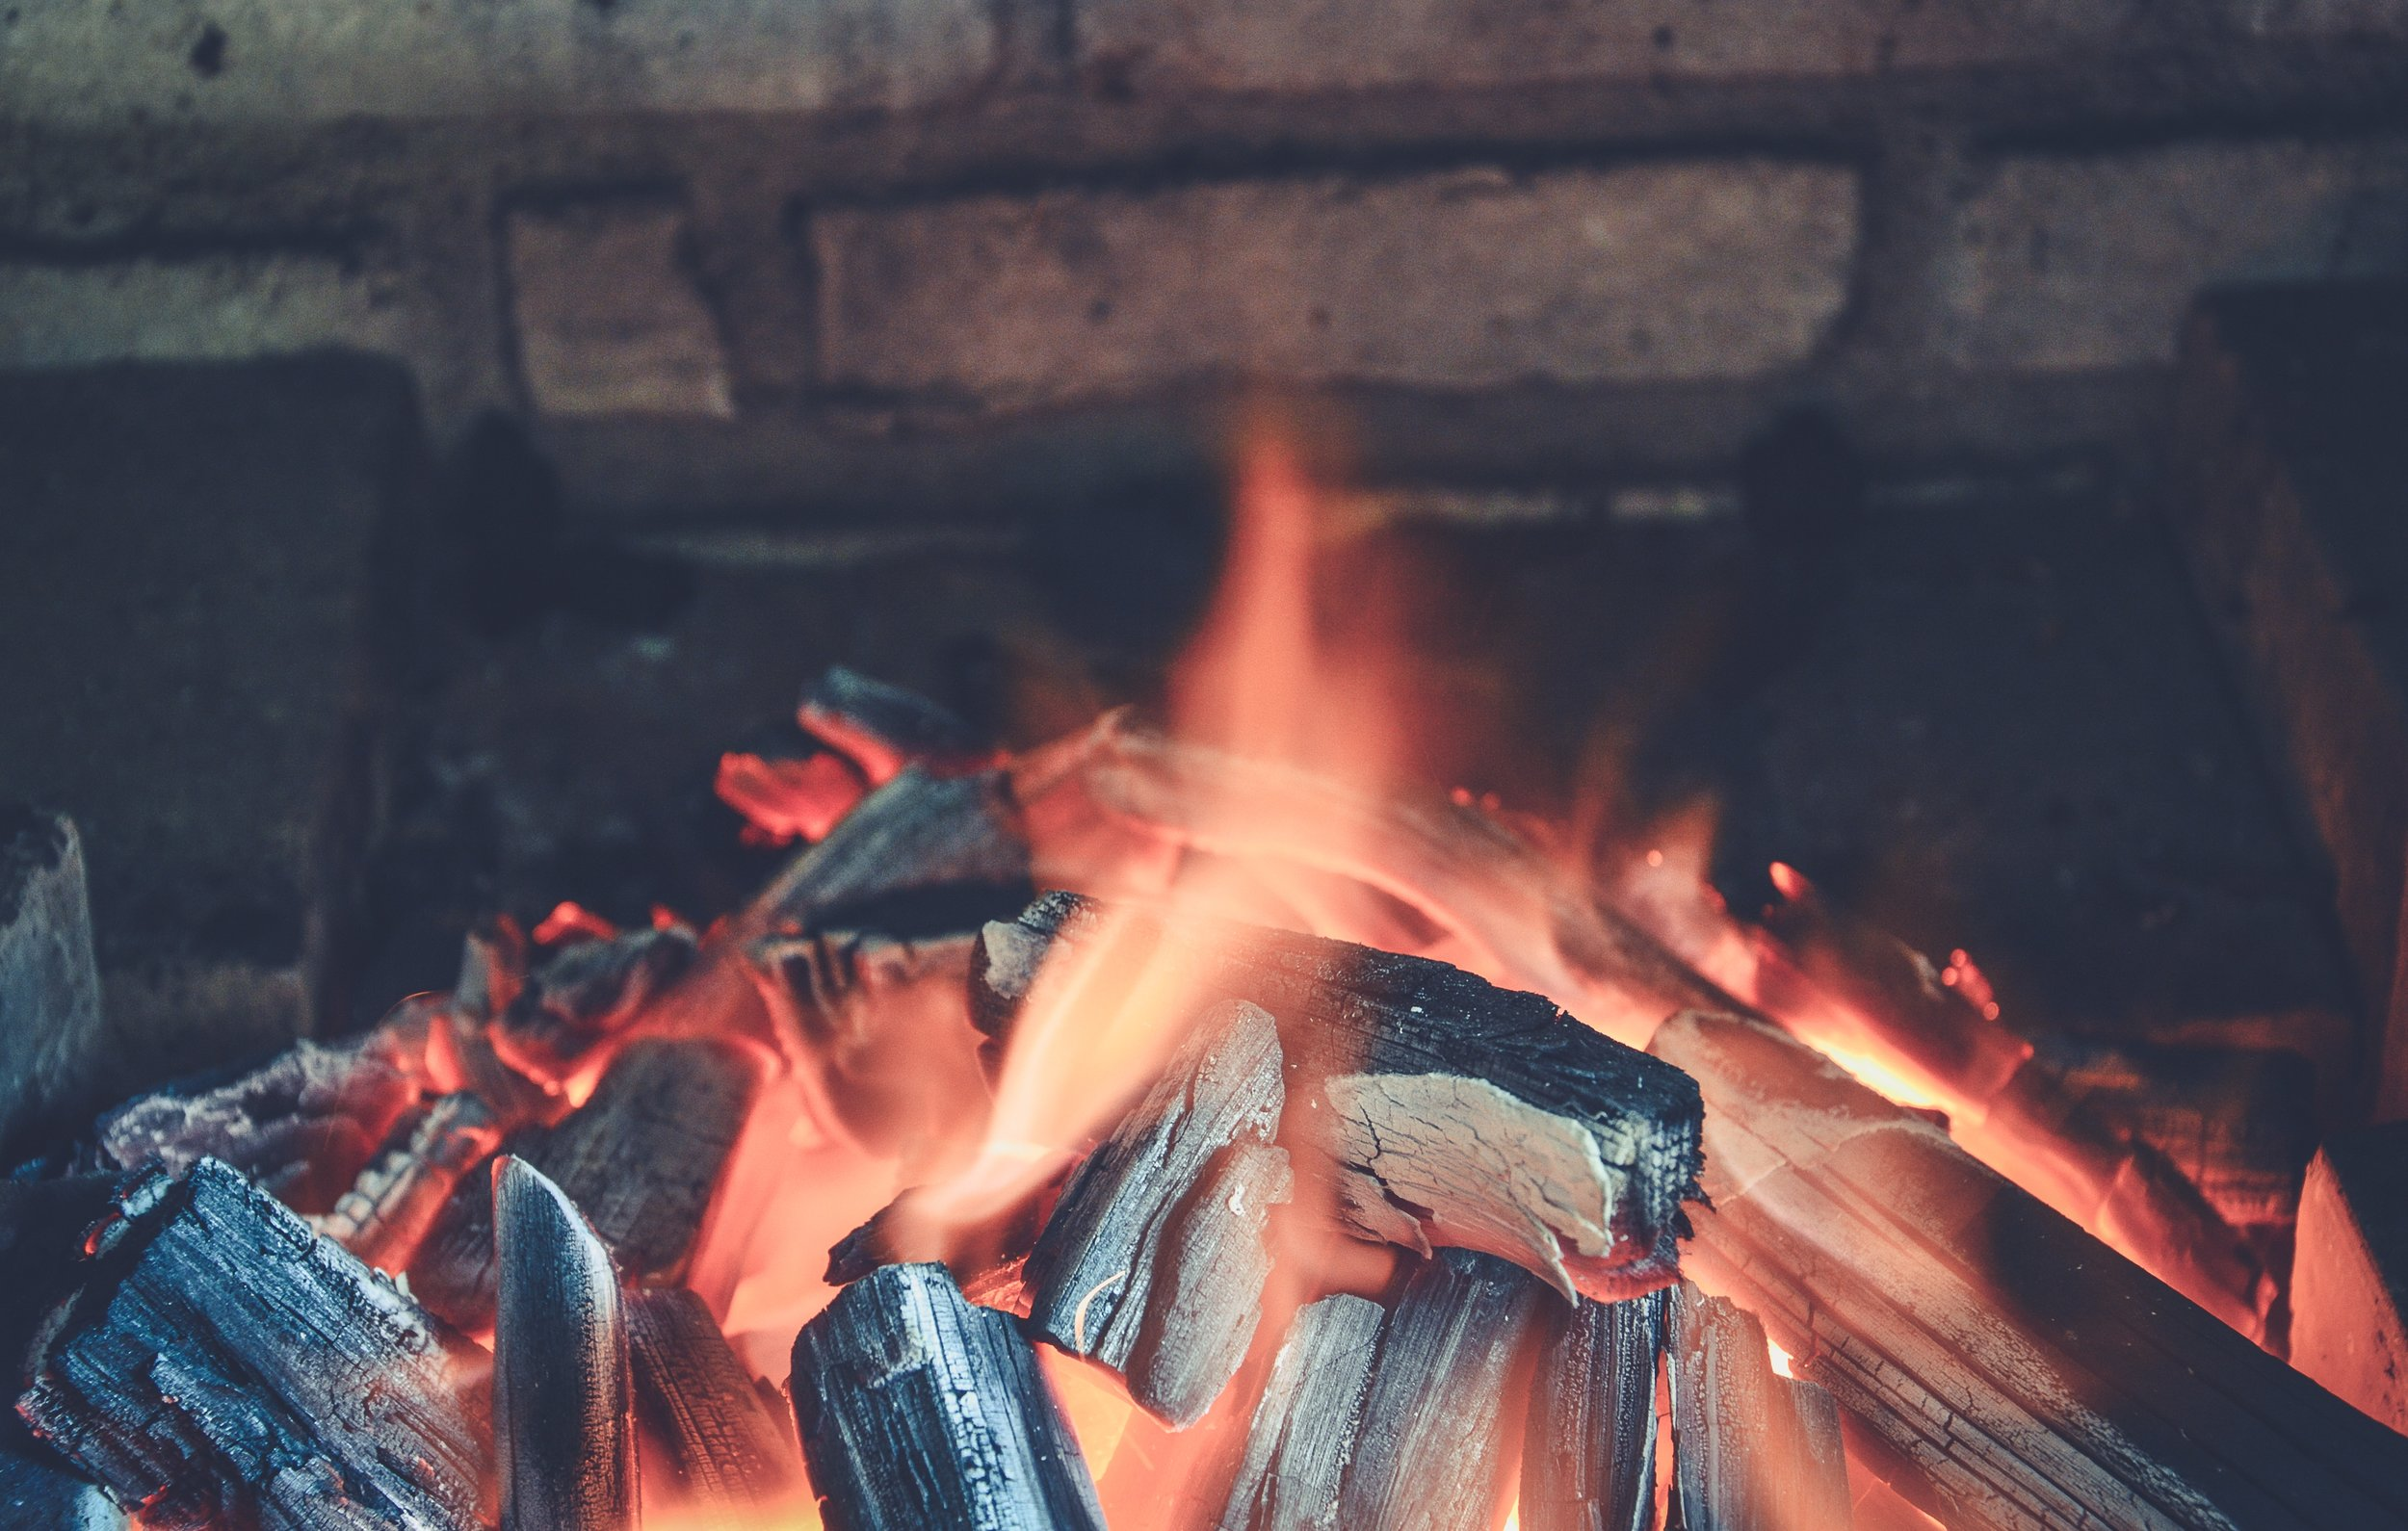 barbecue-bonfire-charcoal-59598.jpg